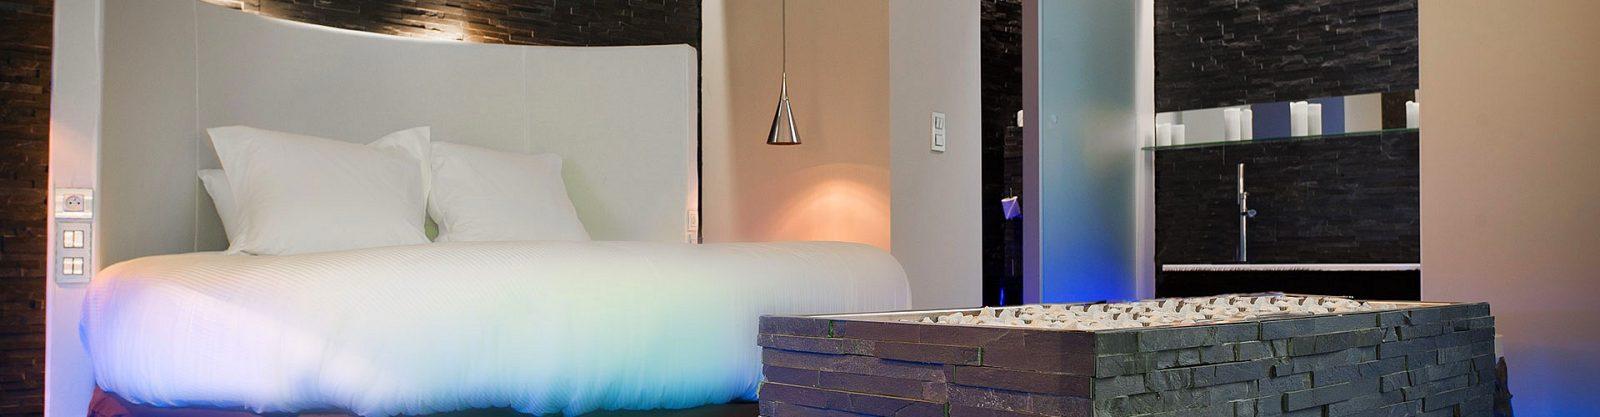 header hotel privatif paris seven hotel